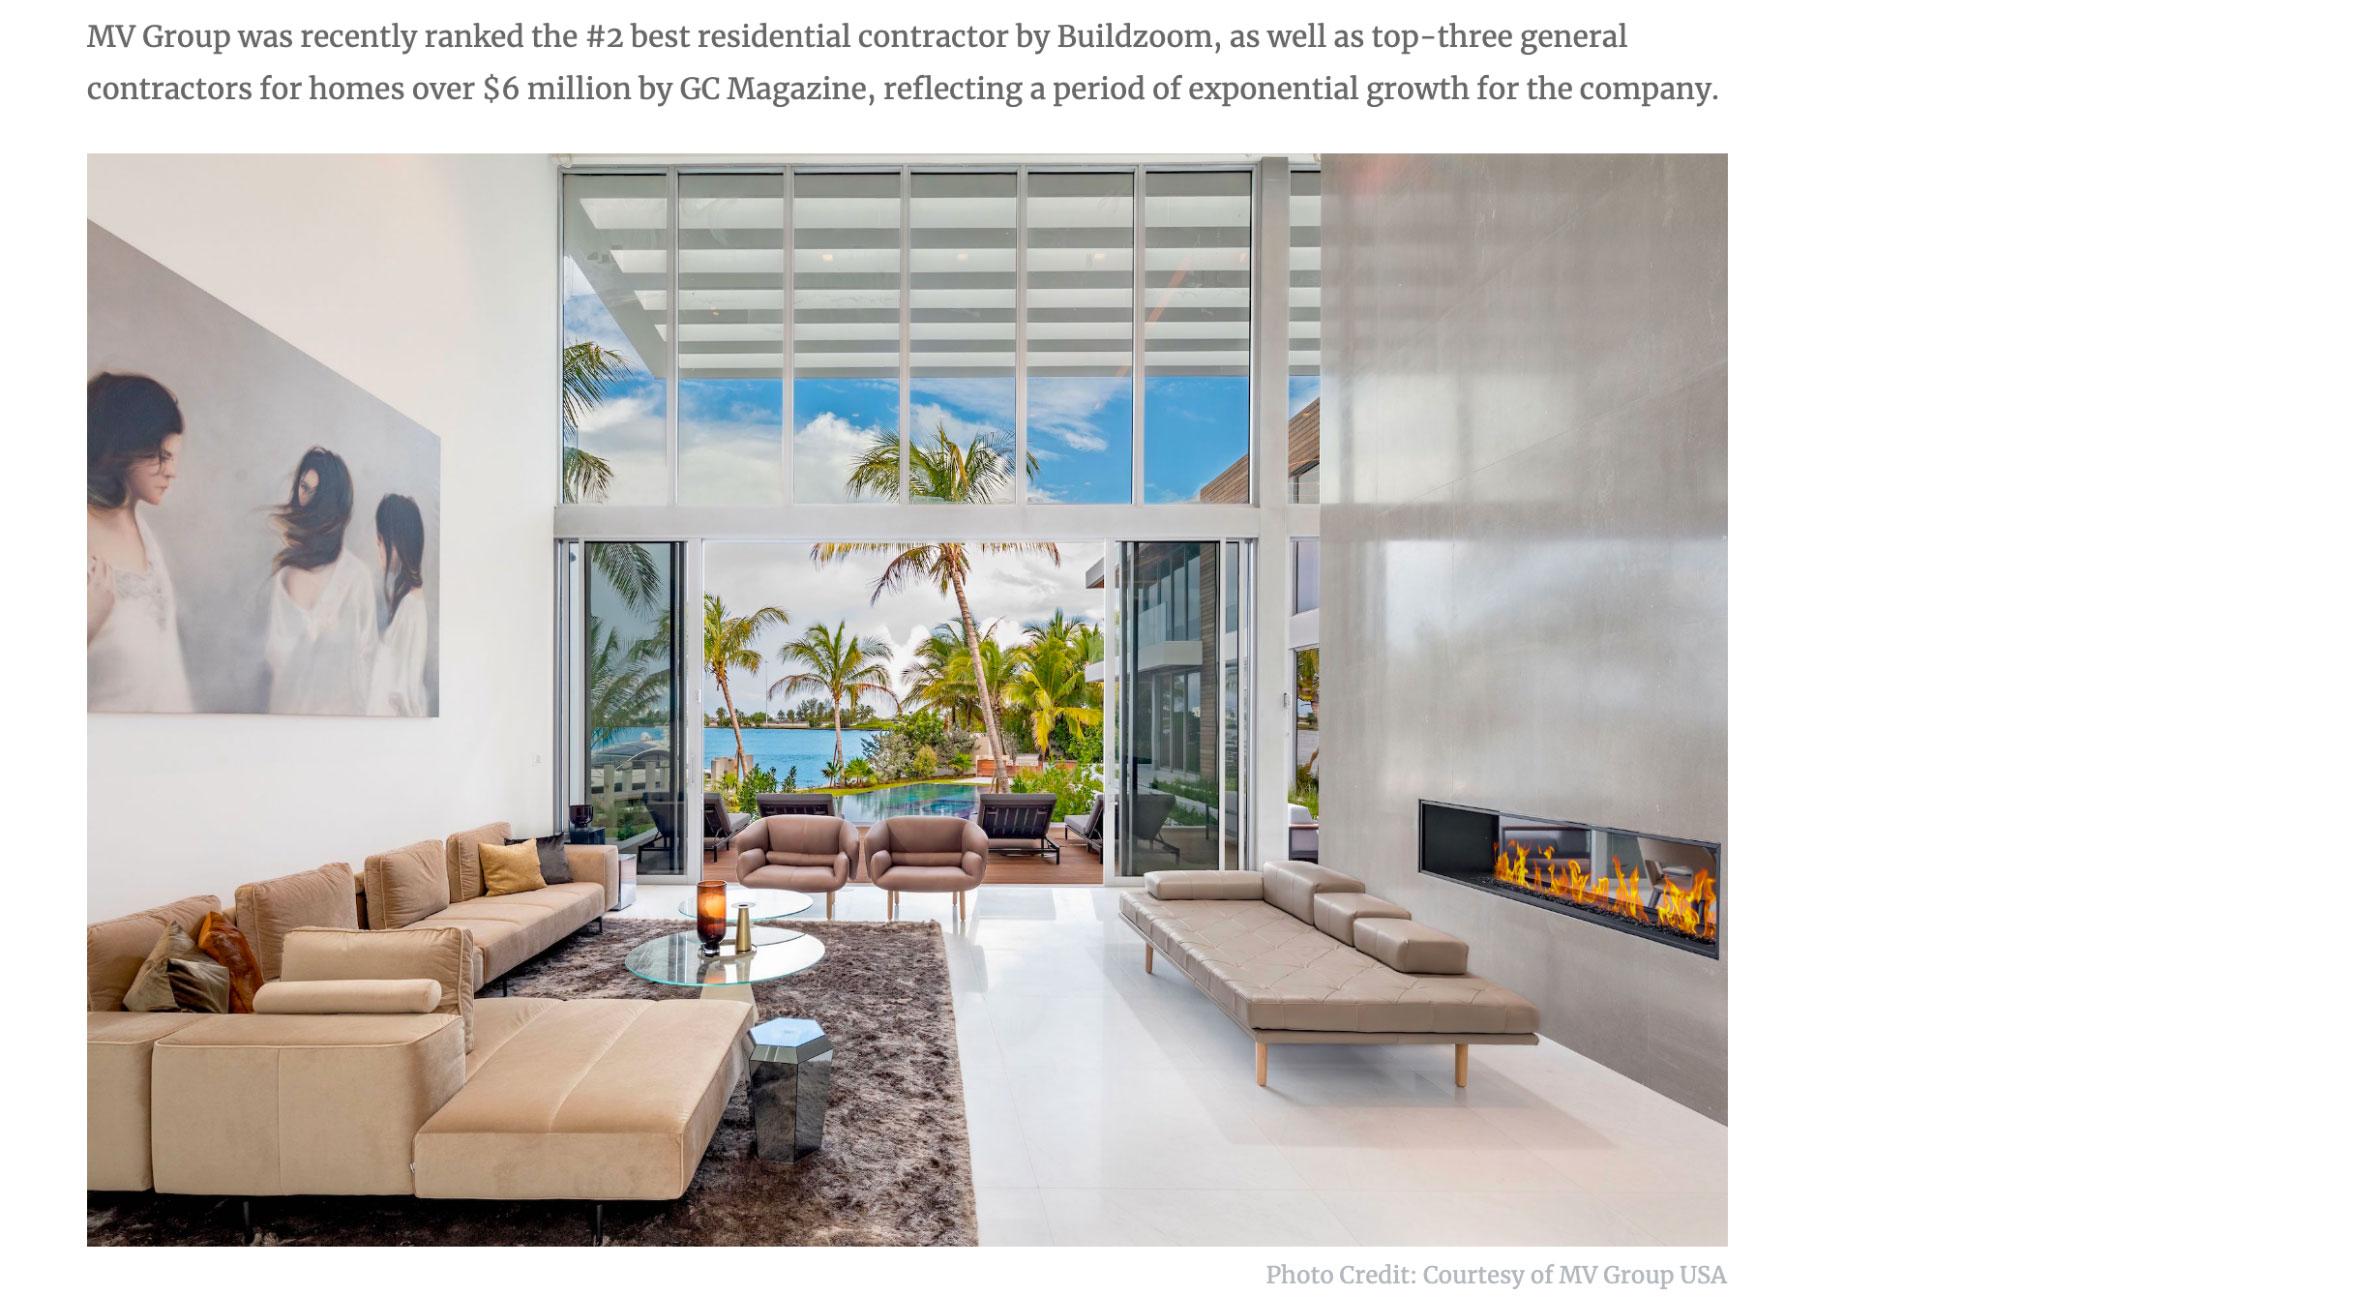 Haute Residence – MV Group Usa Built Bayfront Estate, Closes Sale for $17 Million